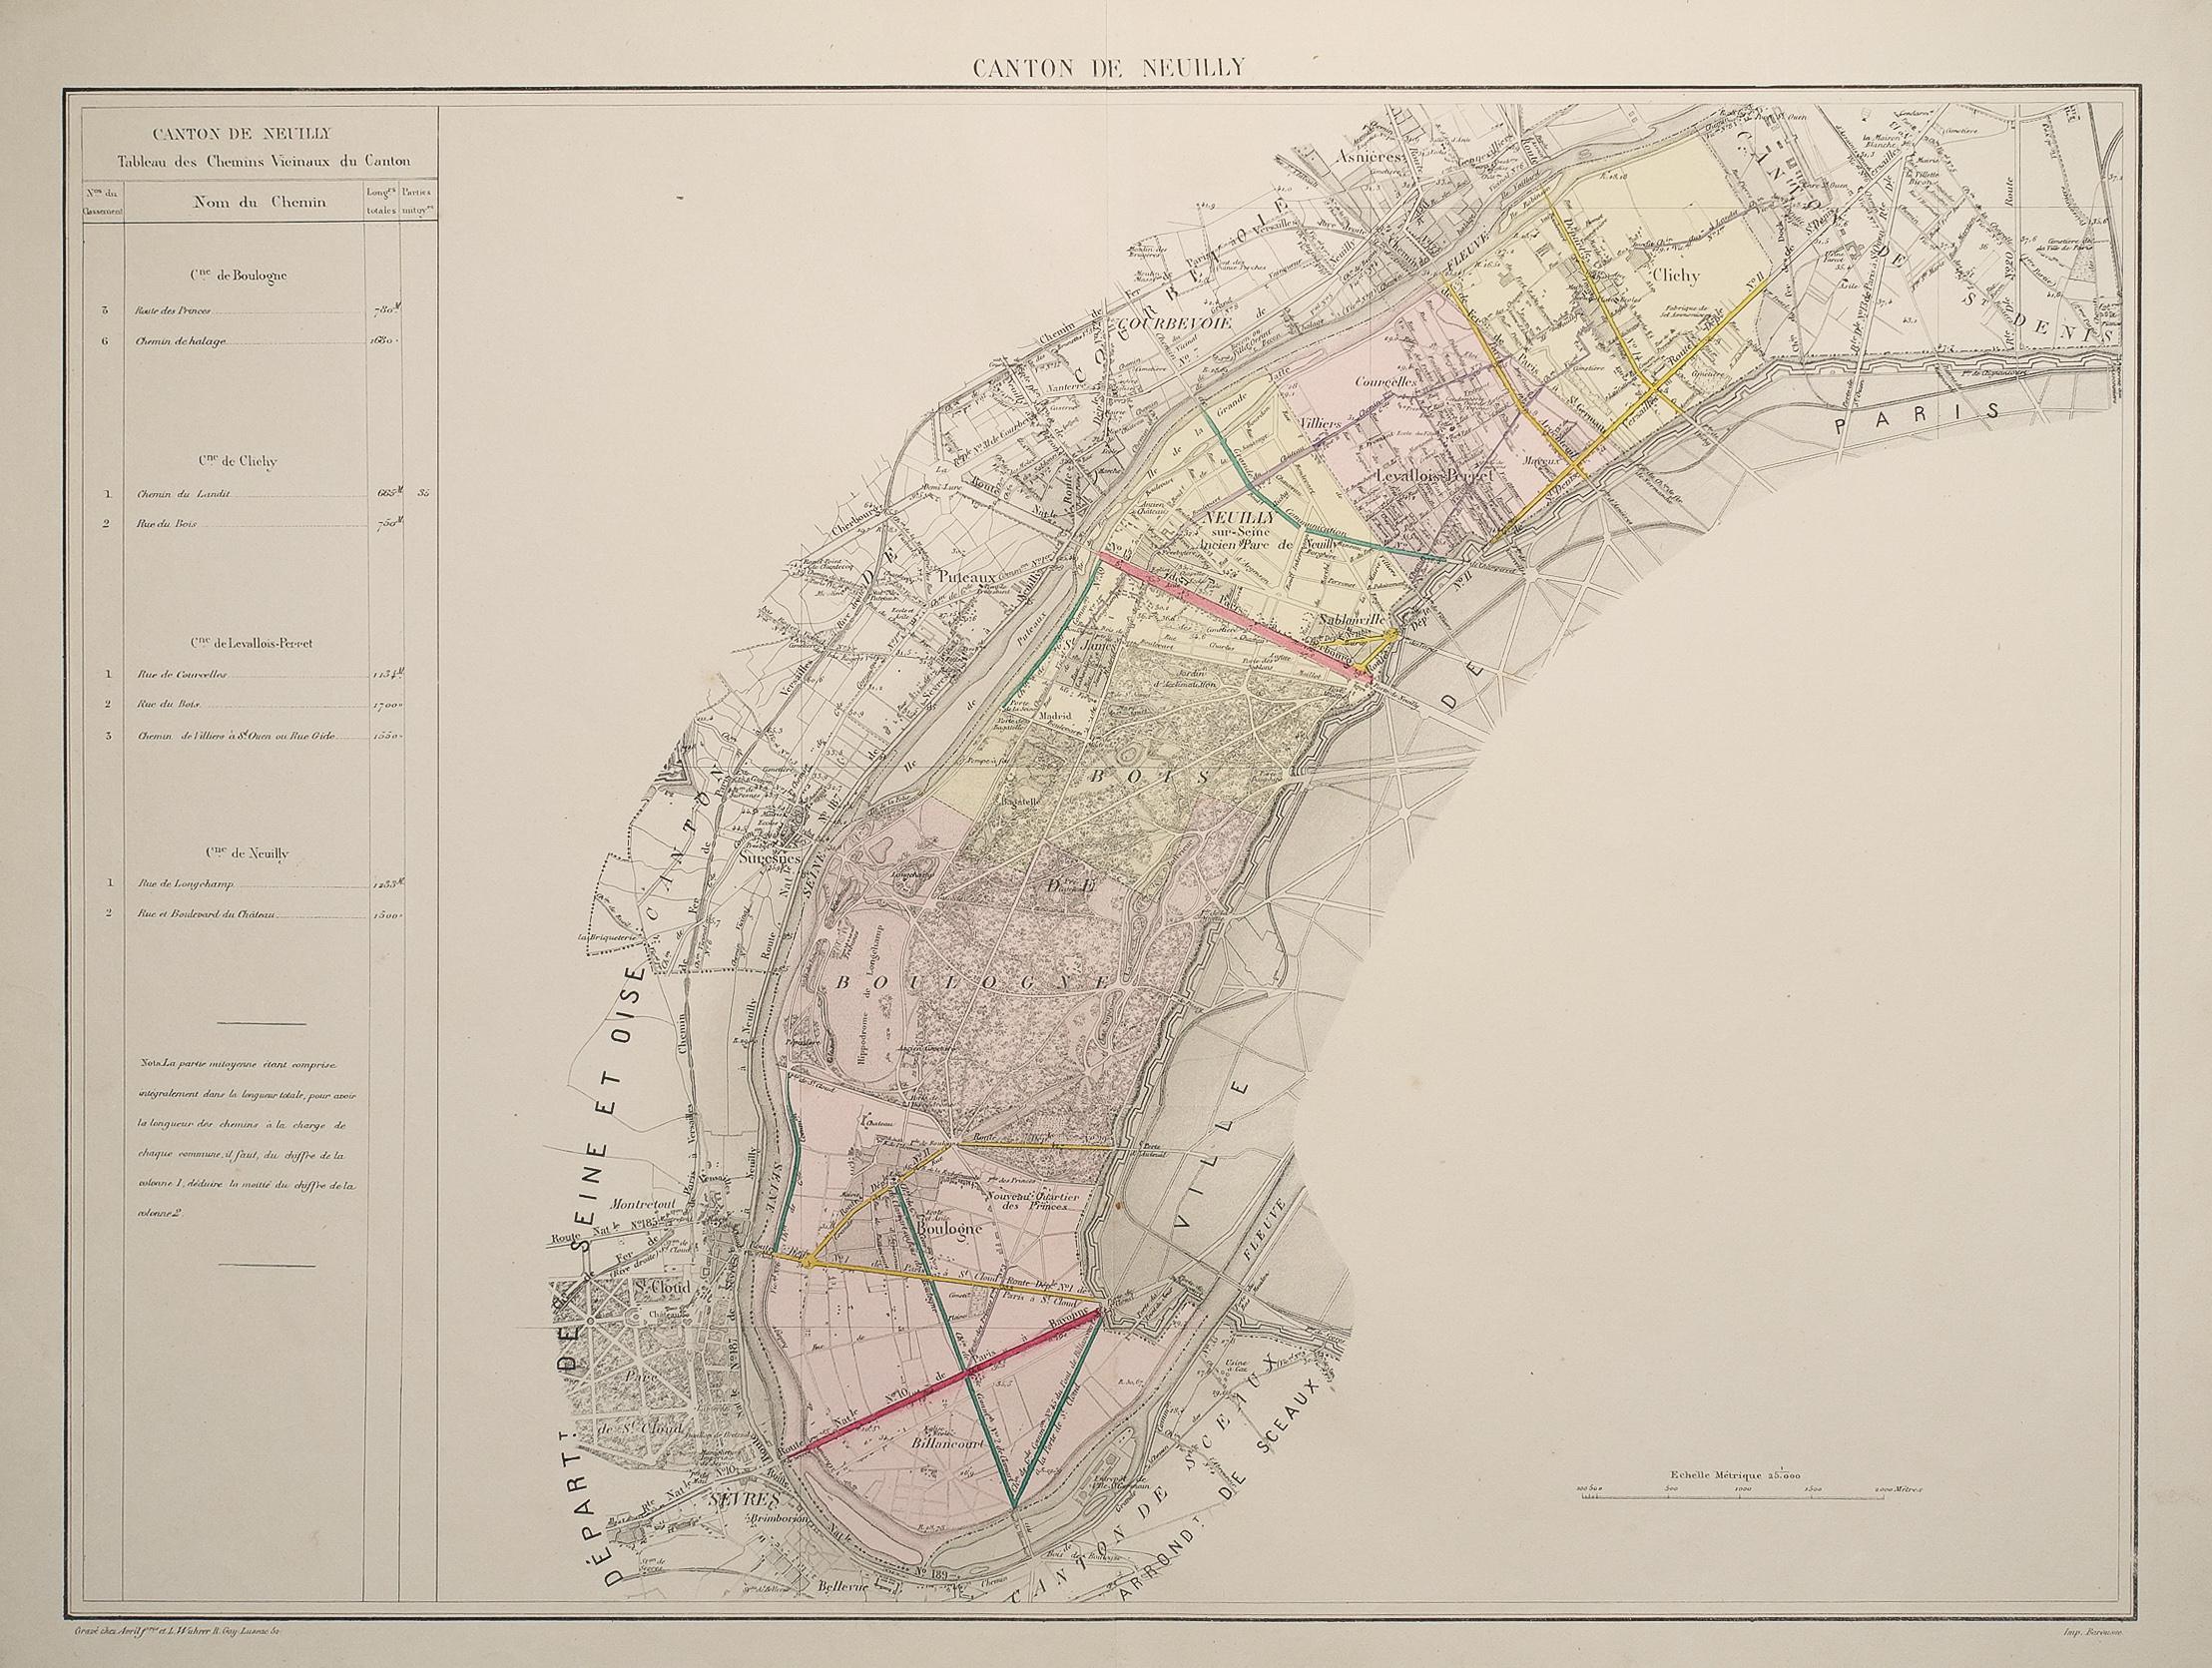 Plan Ancien Neuilly Sur Seine Boulogne Levallois Perret Clichy Original Antique Plan Cartes Livres Anciens Com